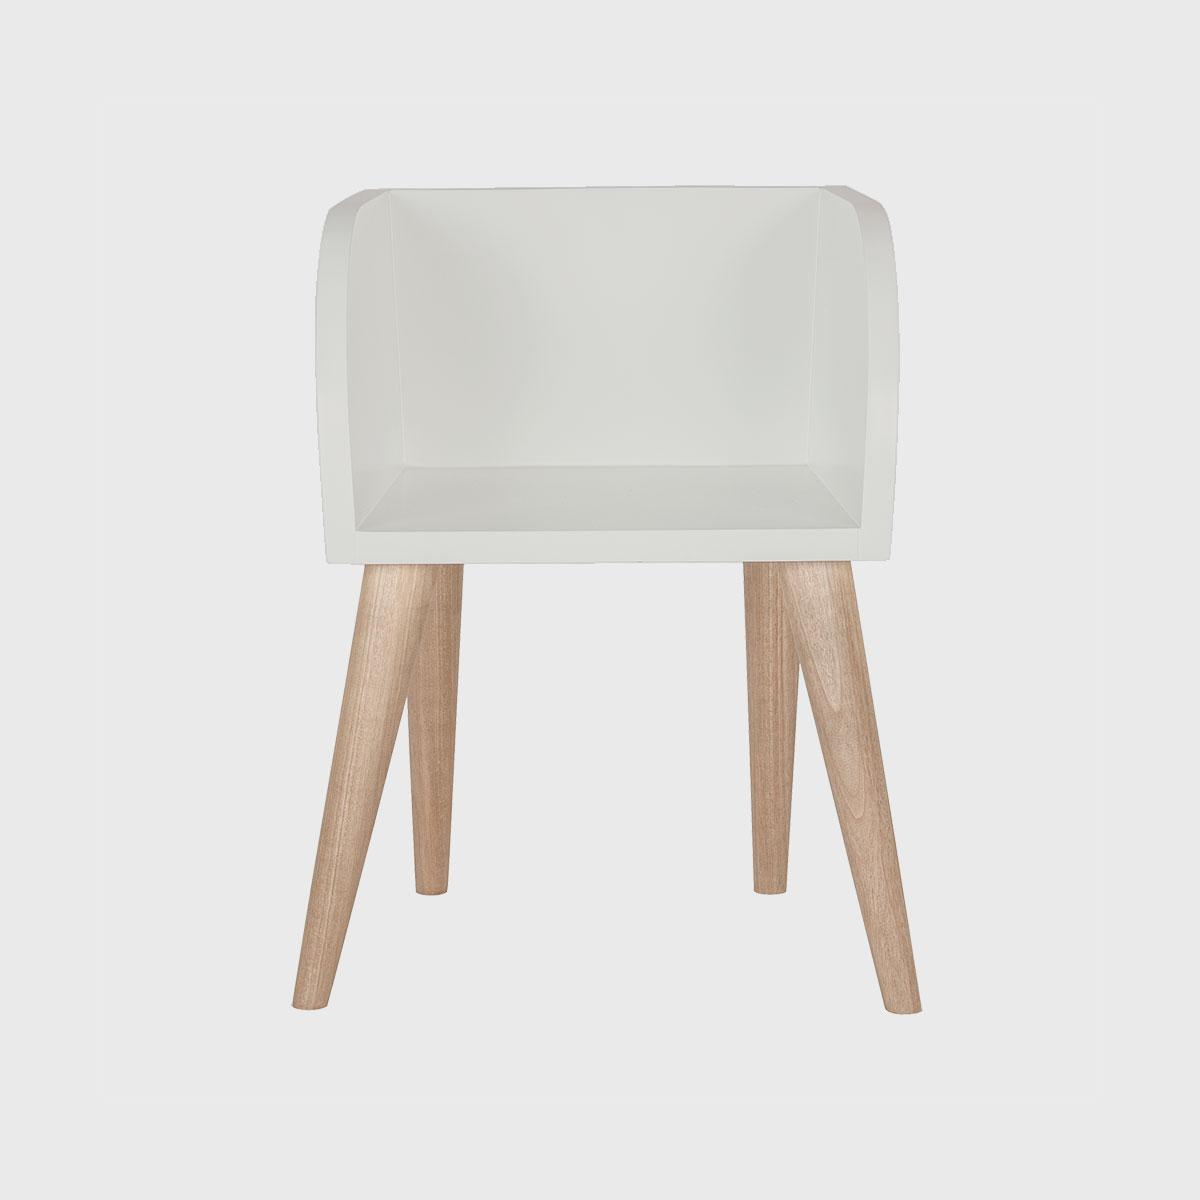 Cadeira ioio jequitibá manteiga pintada